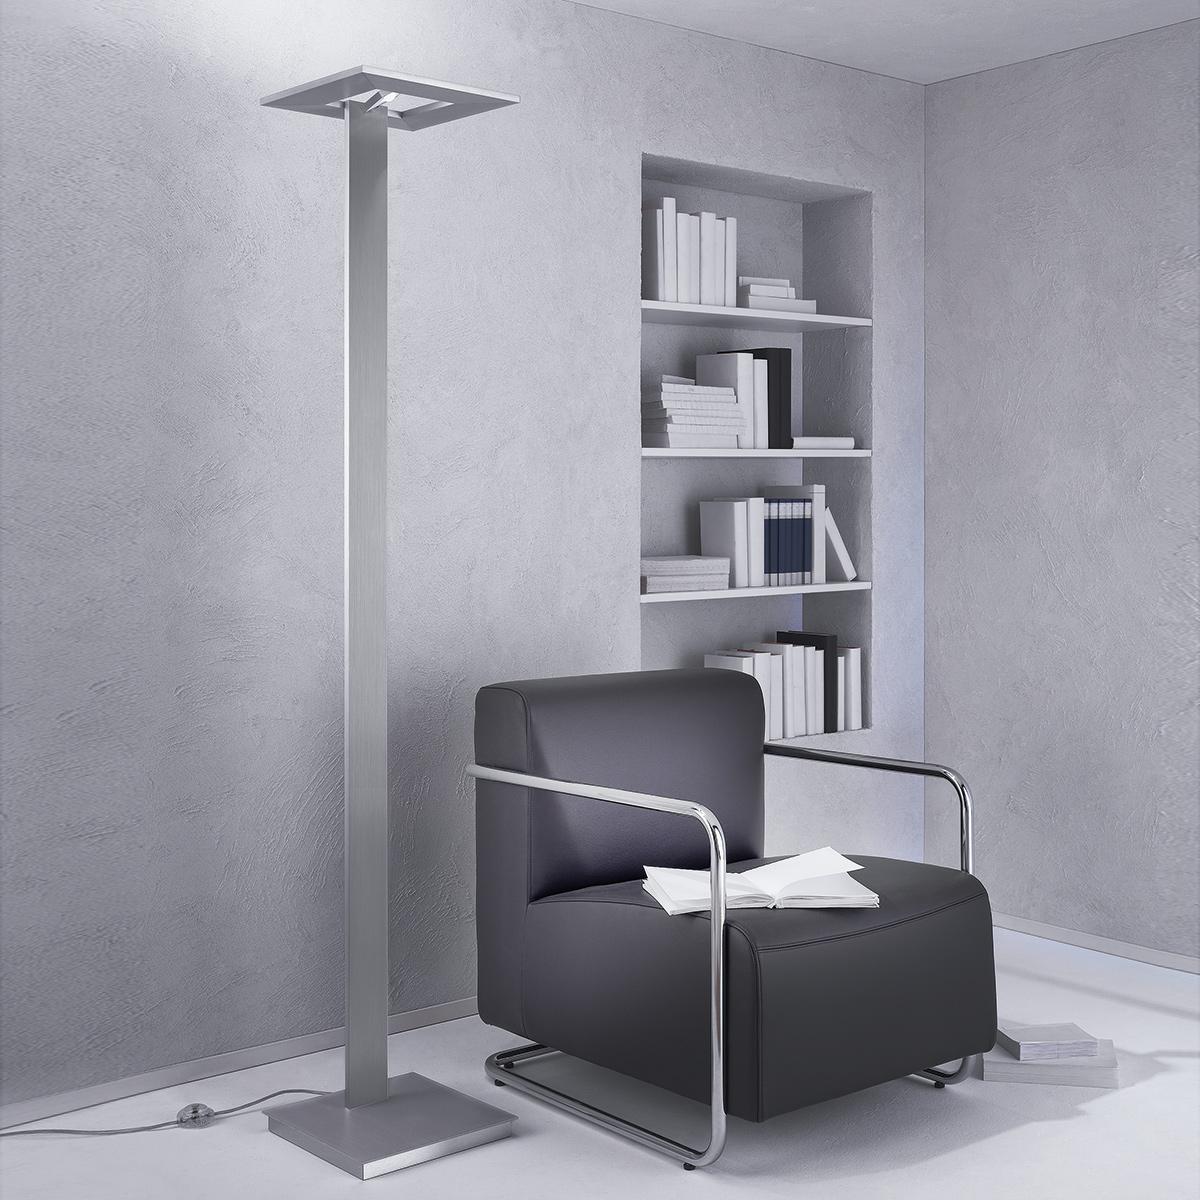 escale zen stehleuchte. Black Bedroom Furniture Sets. Home Design Ideas